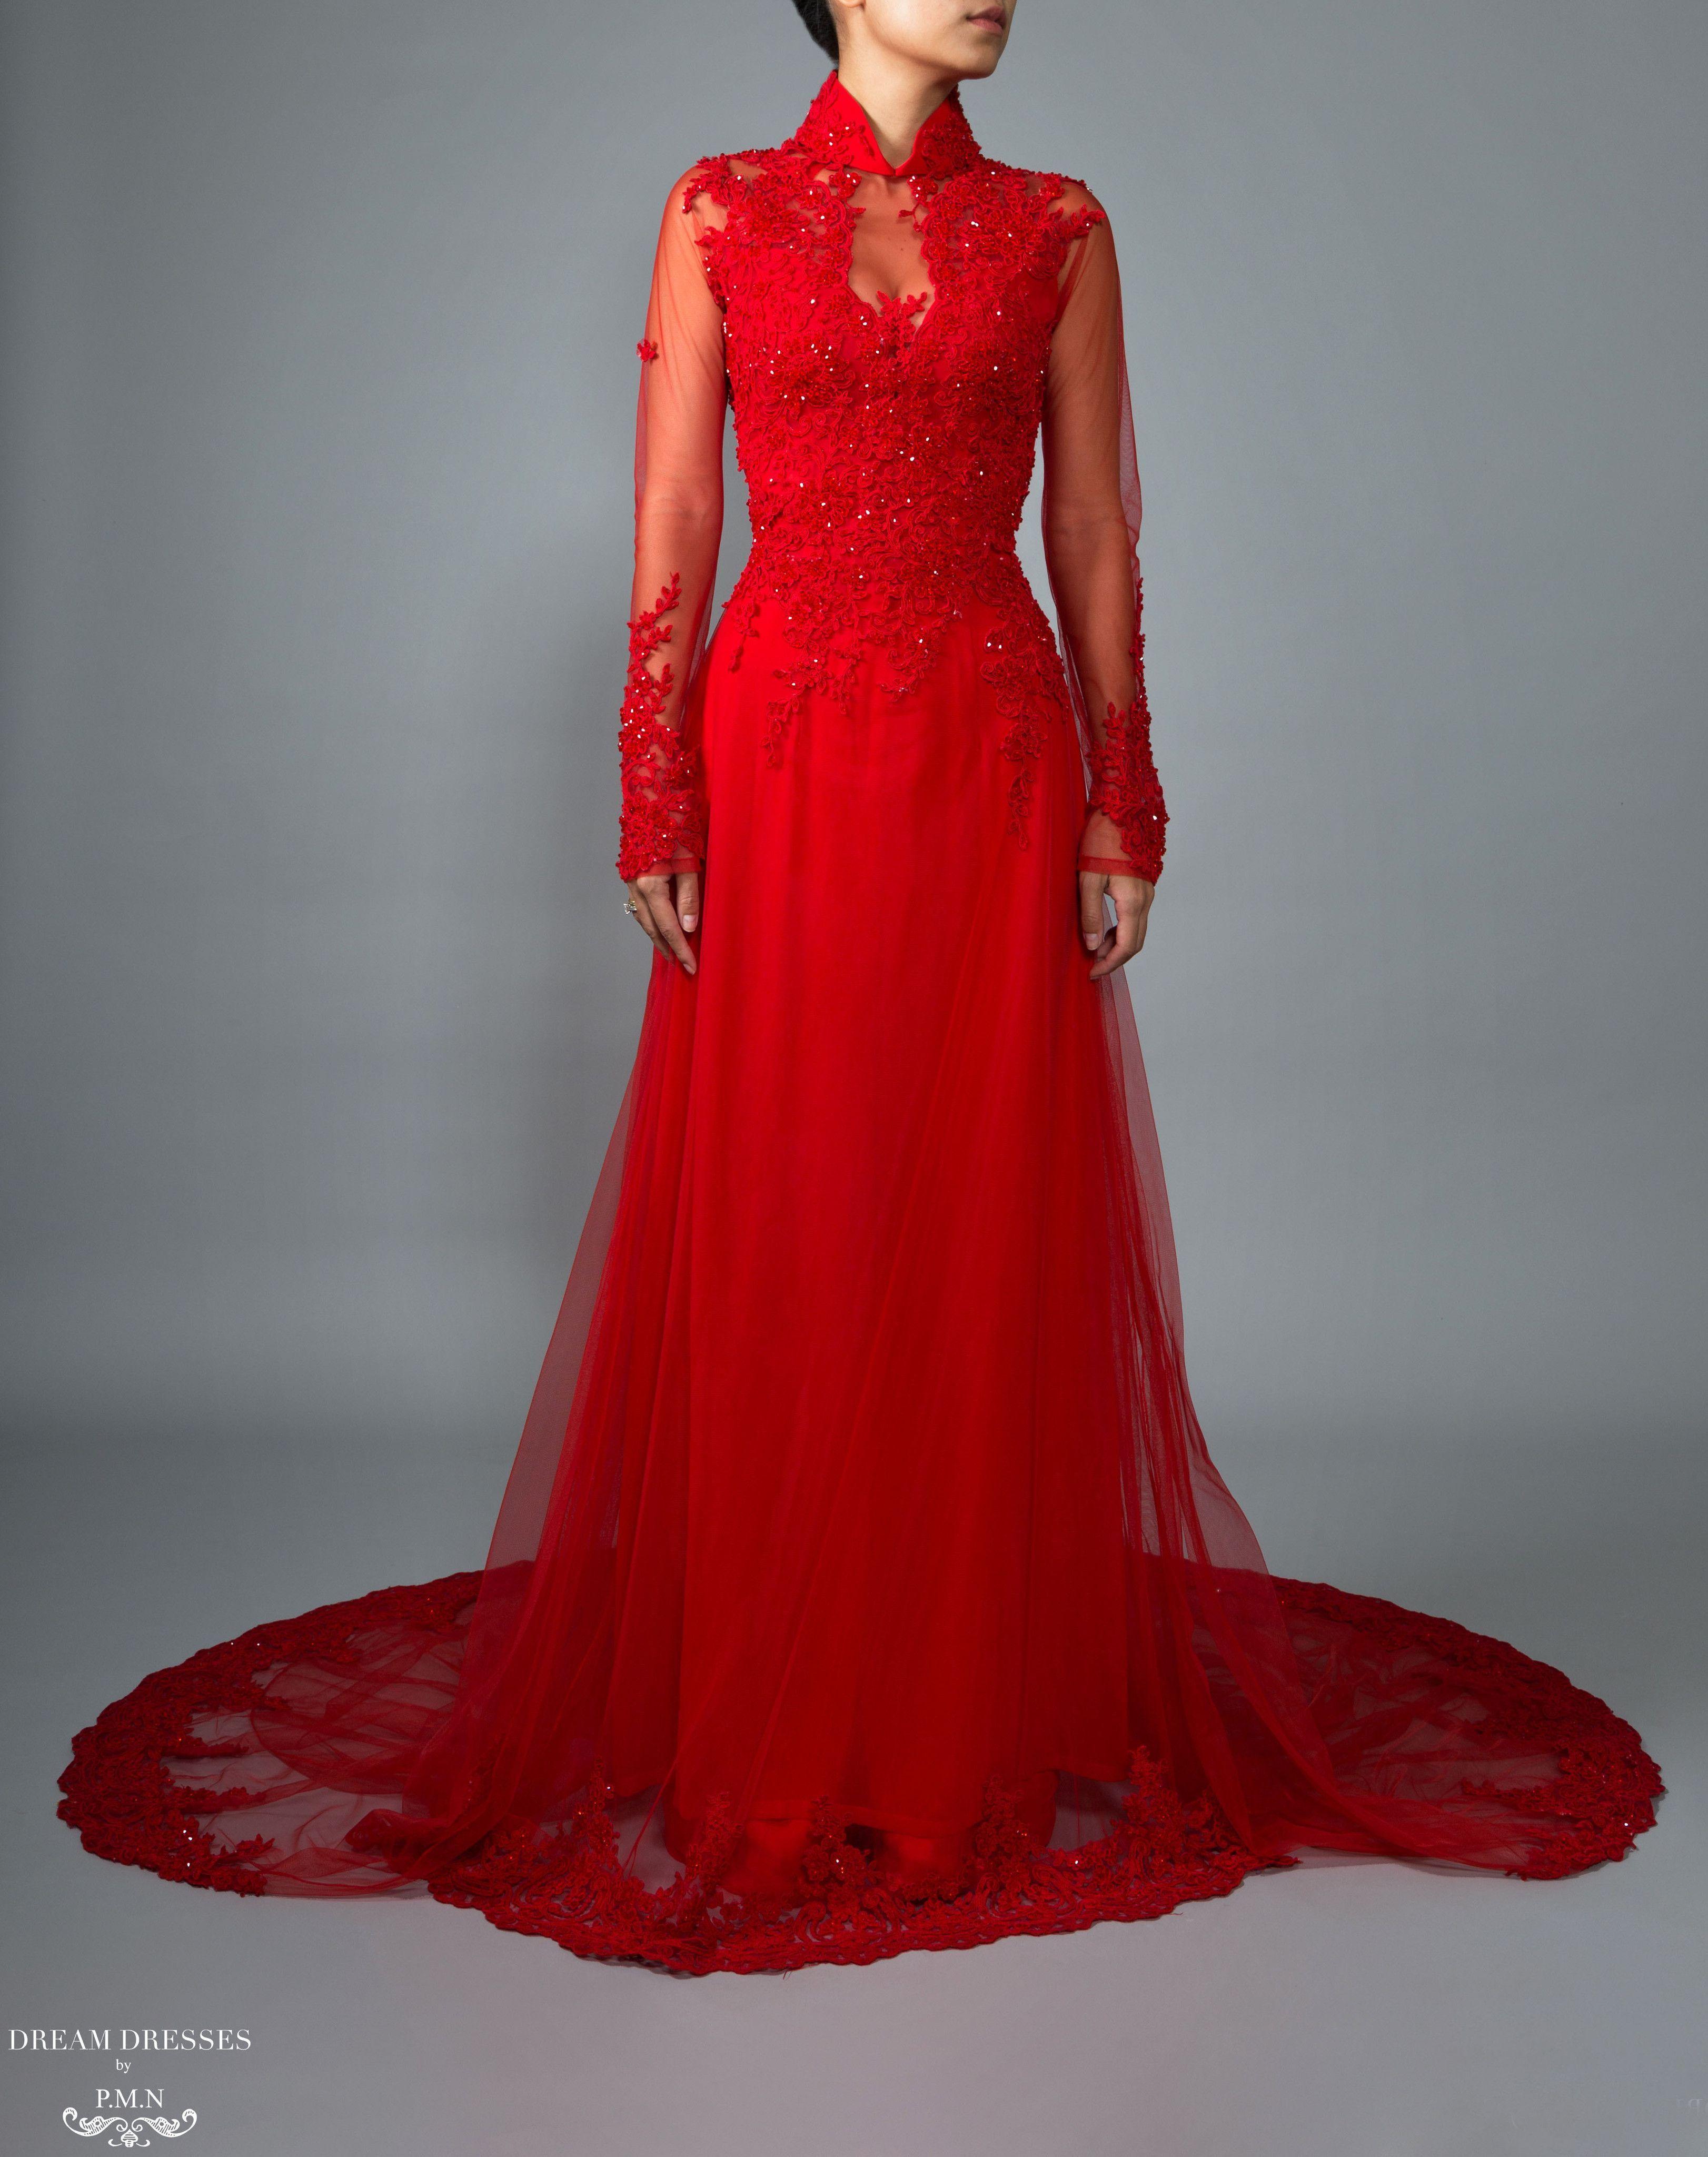 Red Ao Dai Vietnamese Lace Bridal Dress (VIONA) (With